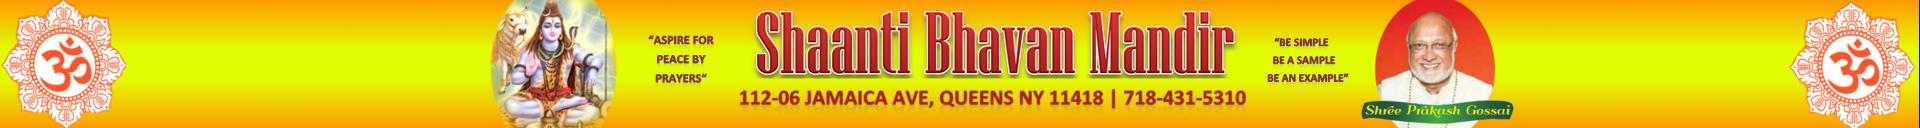 Shaanti Bhavan Mandir